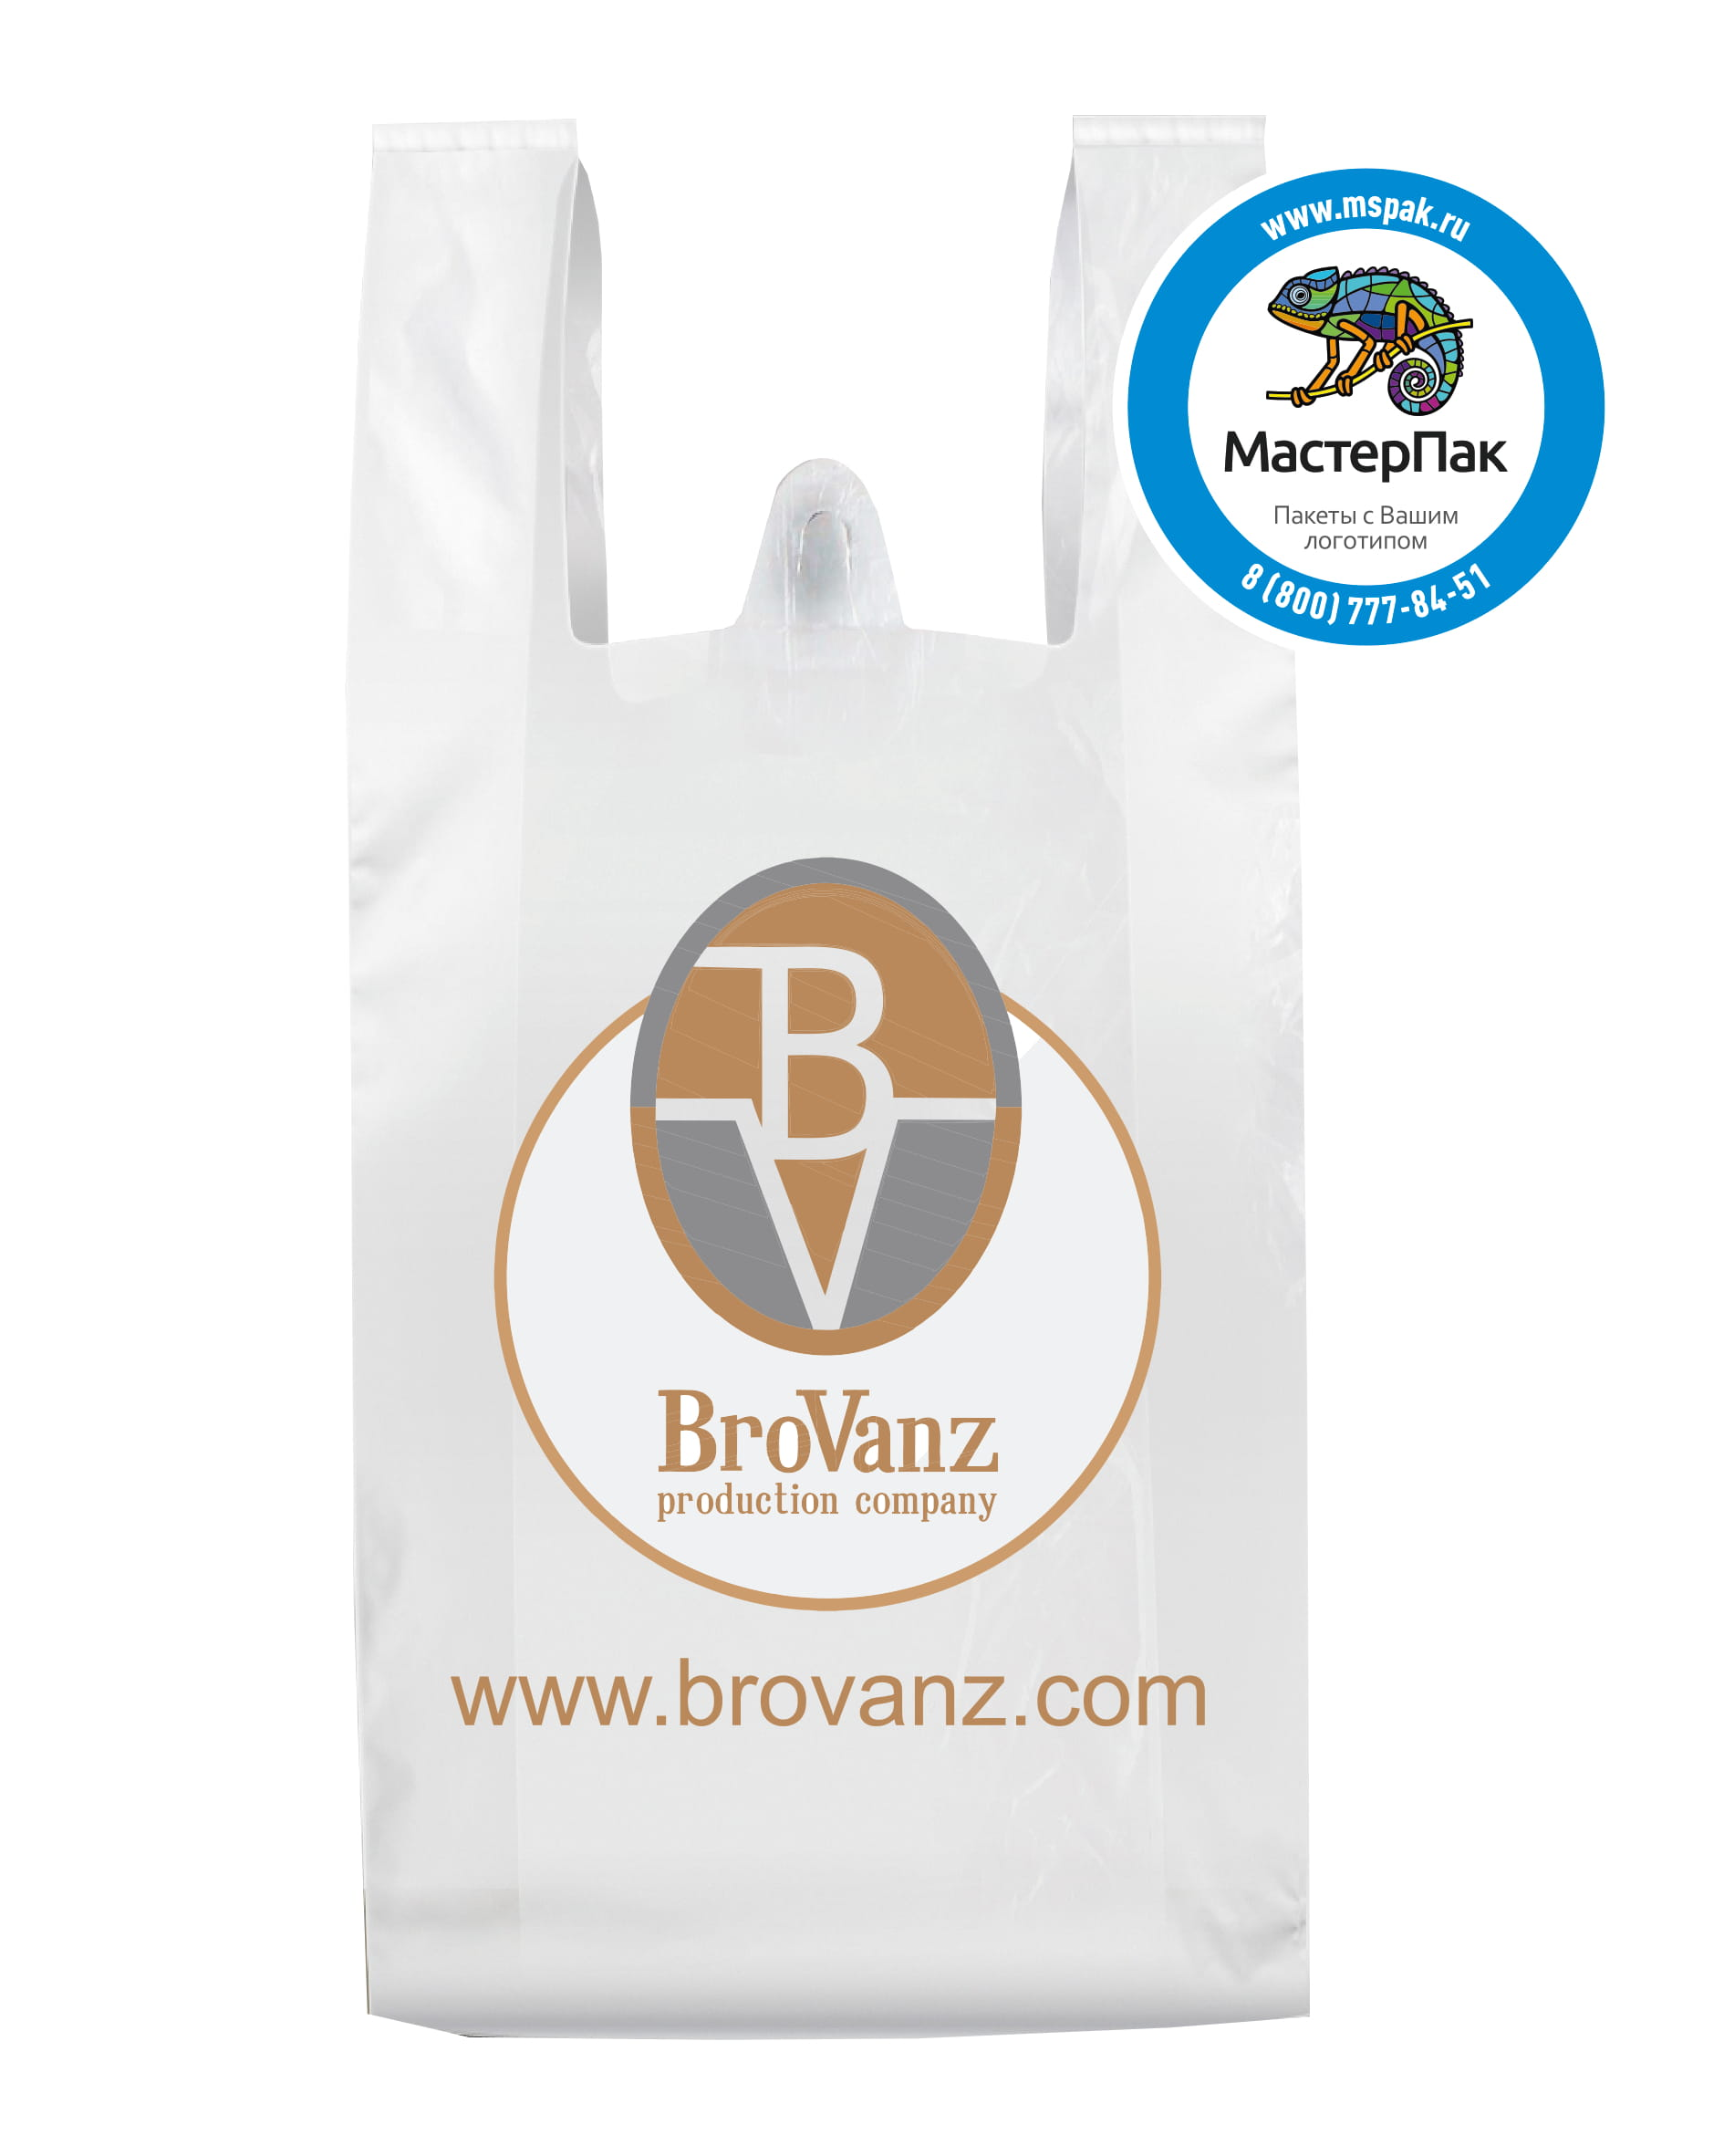 Пакет-майка ПНД с логотипом BroVanz, Москва